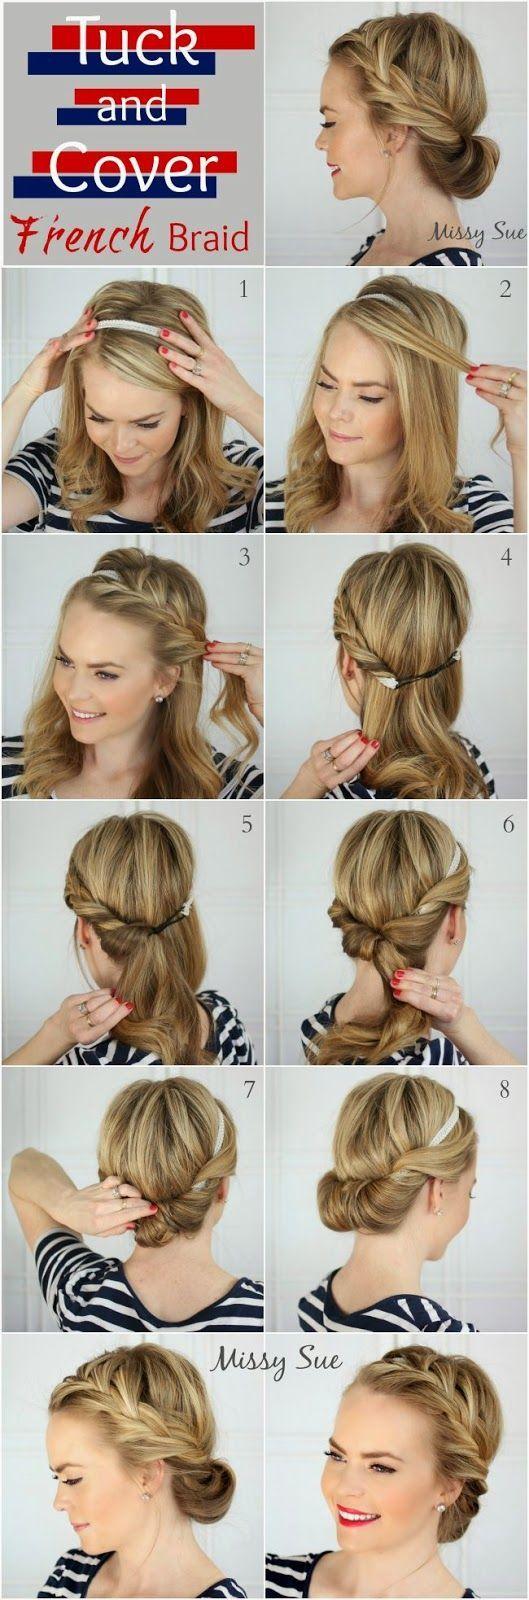 Short Cut Hairstyles 13